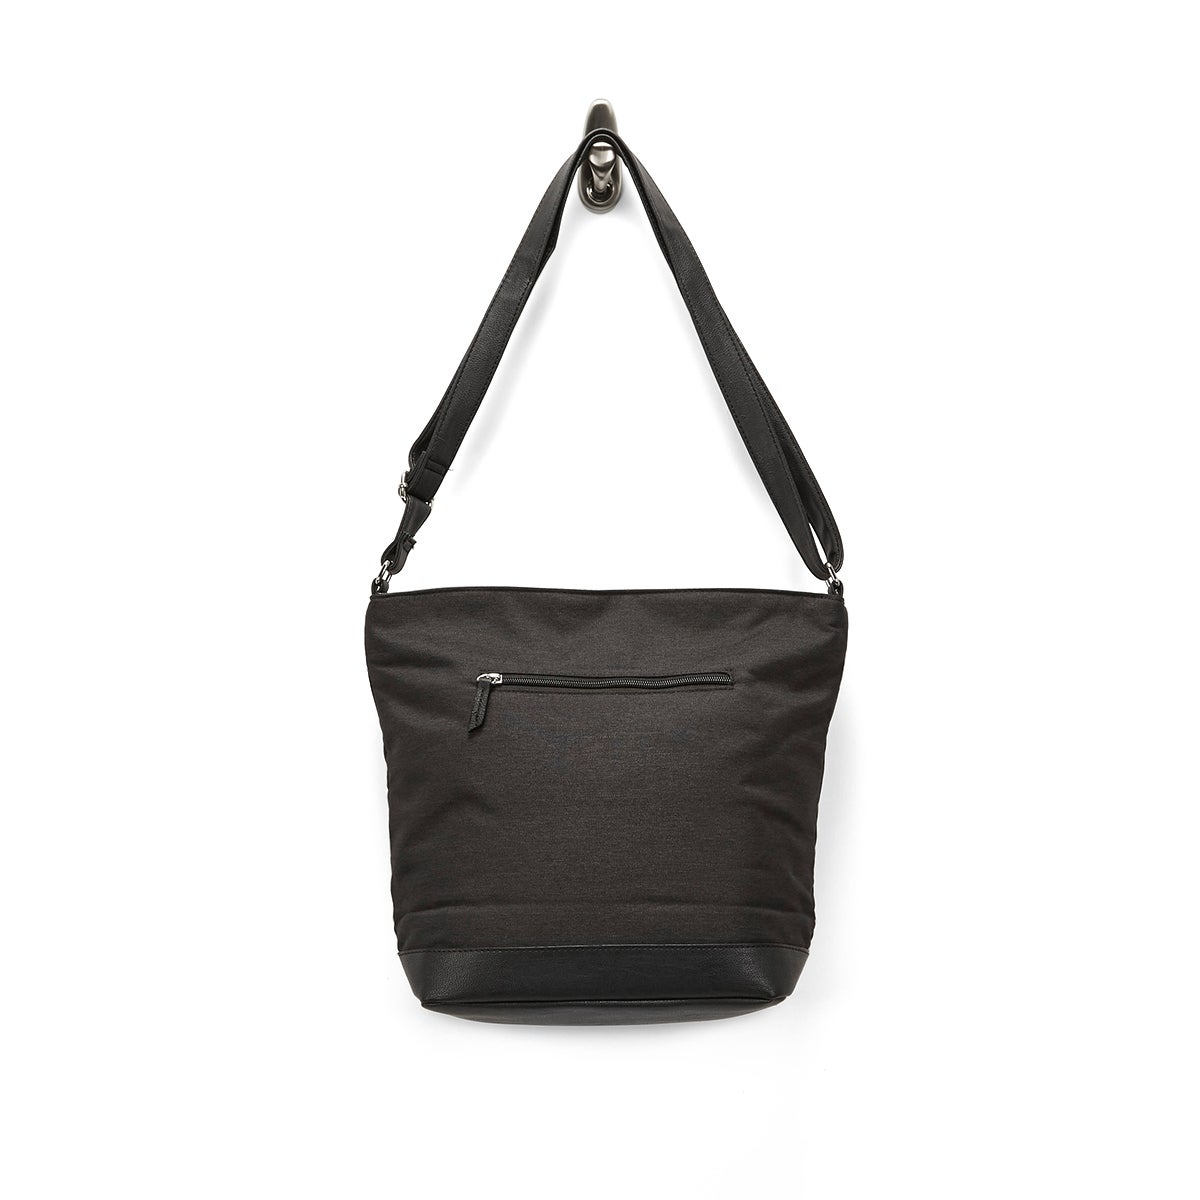 LdsRoots73 black top zip large hobo bag